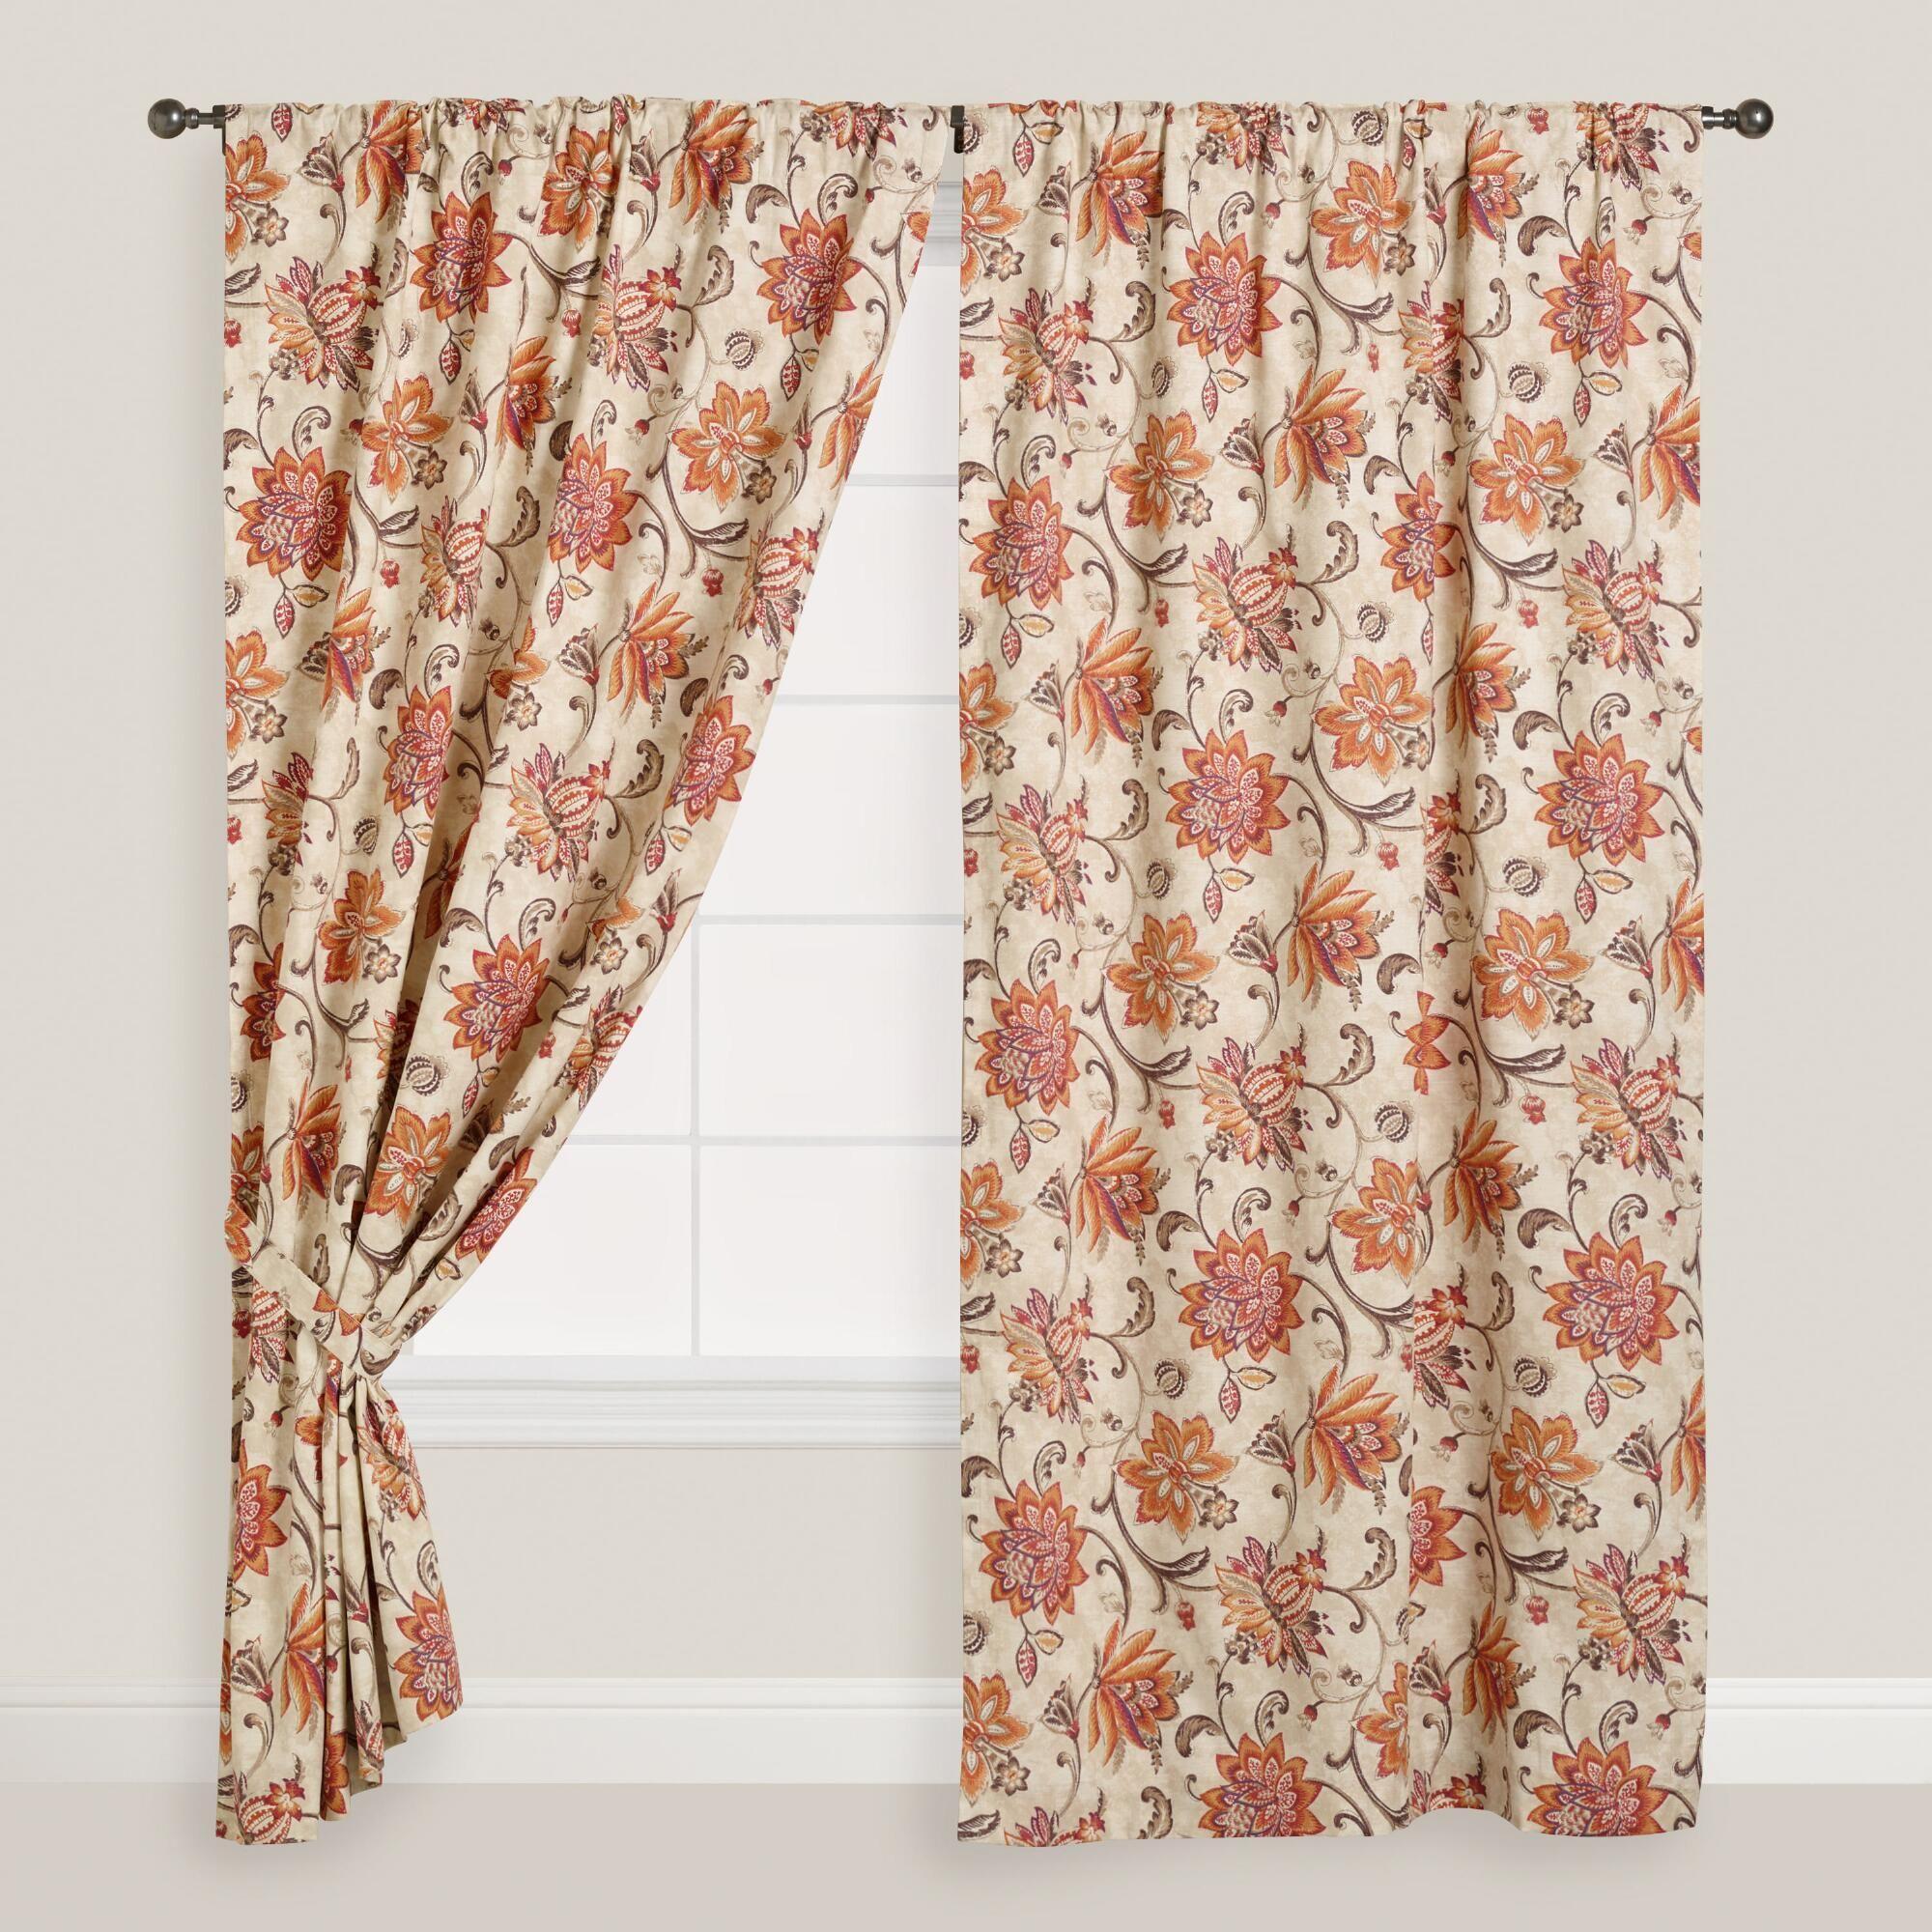 Coral & Pink Floral Eva Concealed Tab Top Curtains, Set Of